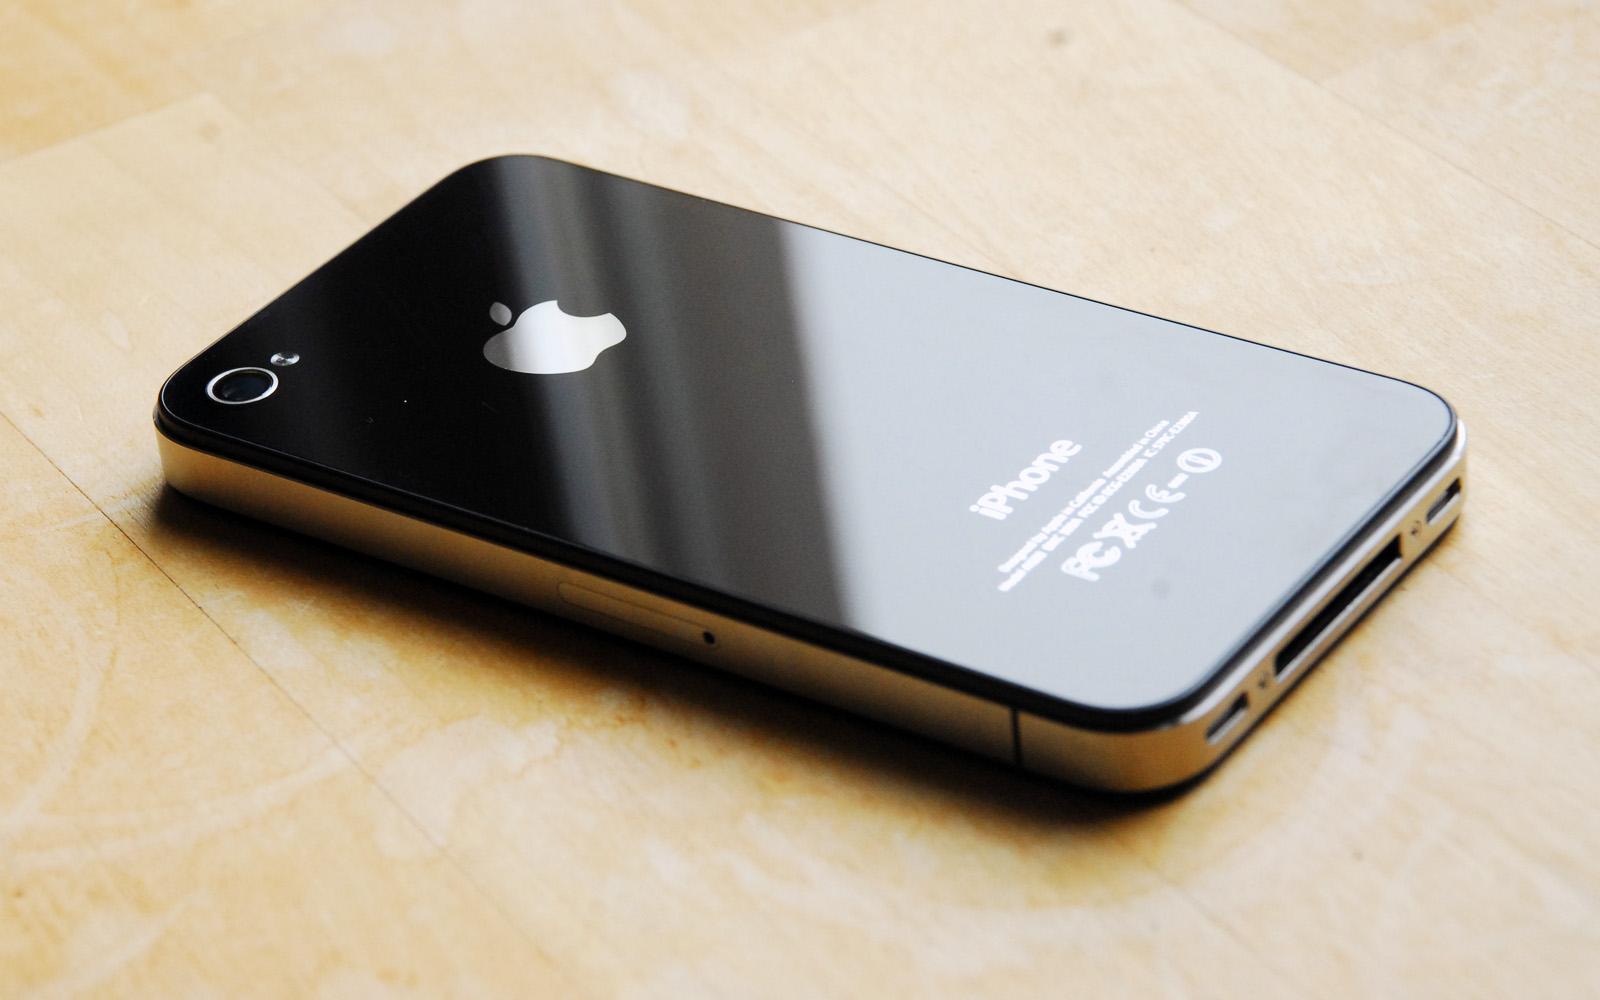 iPhone 4S Launch Pulls Apple's Stocks Down